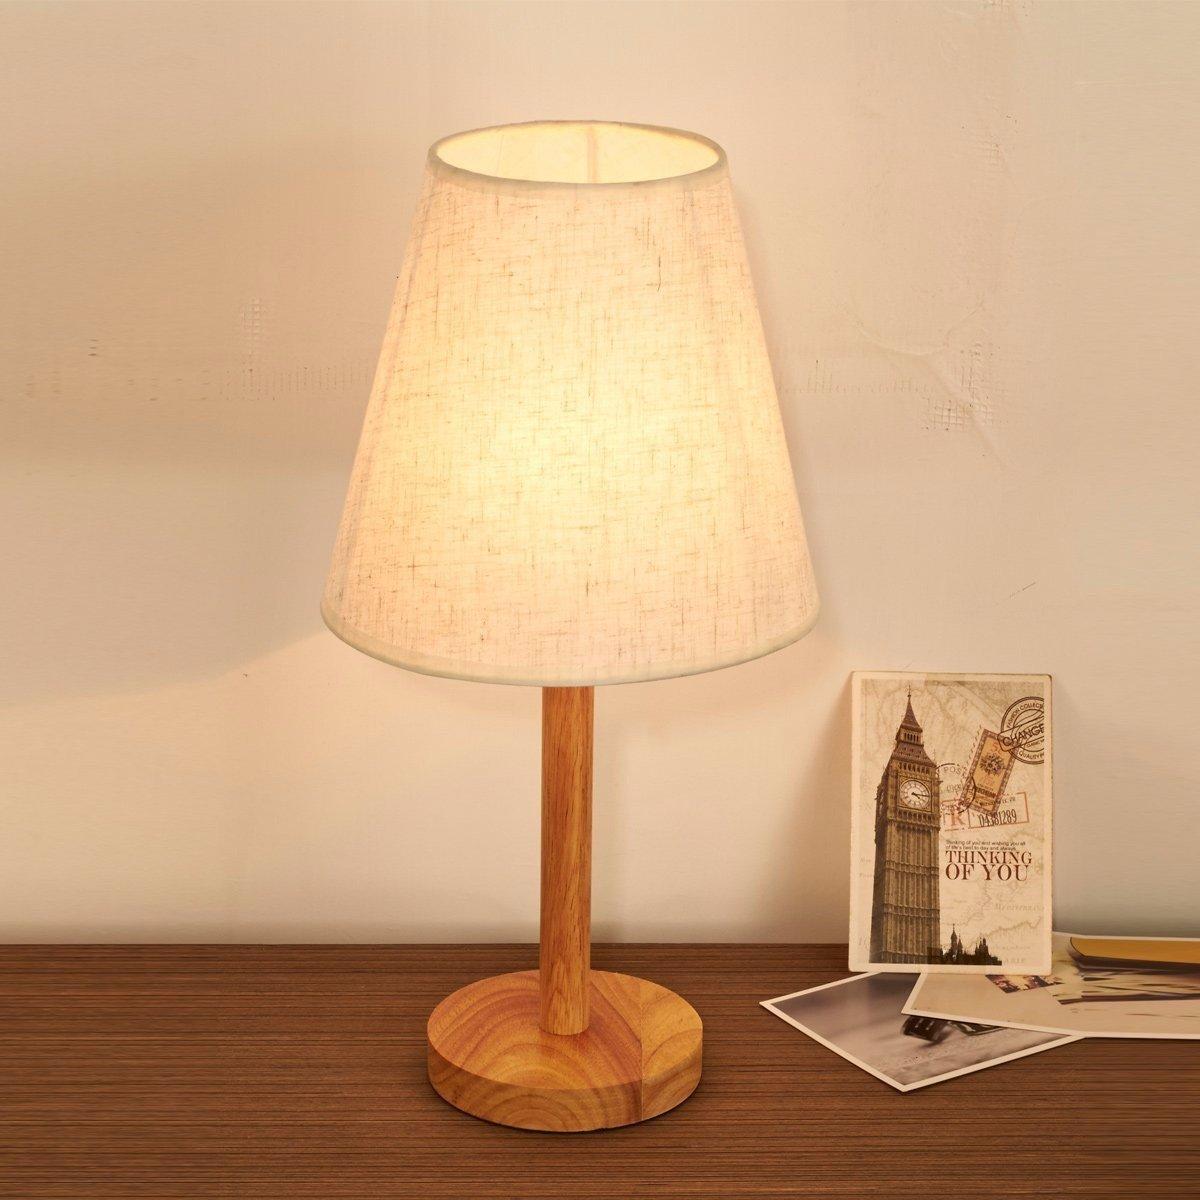 Modern Table Lamp for Bedroom Beautiful Lonfenne Ms Minimalist Modern Table Lamp Bedside Desk